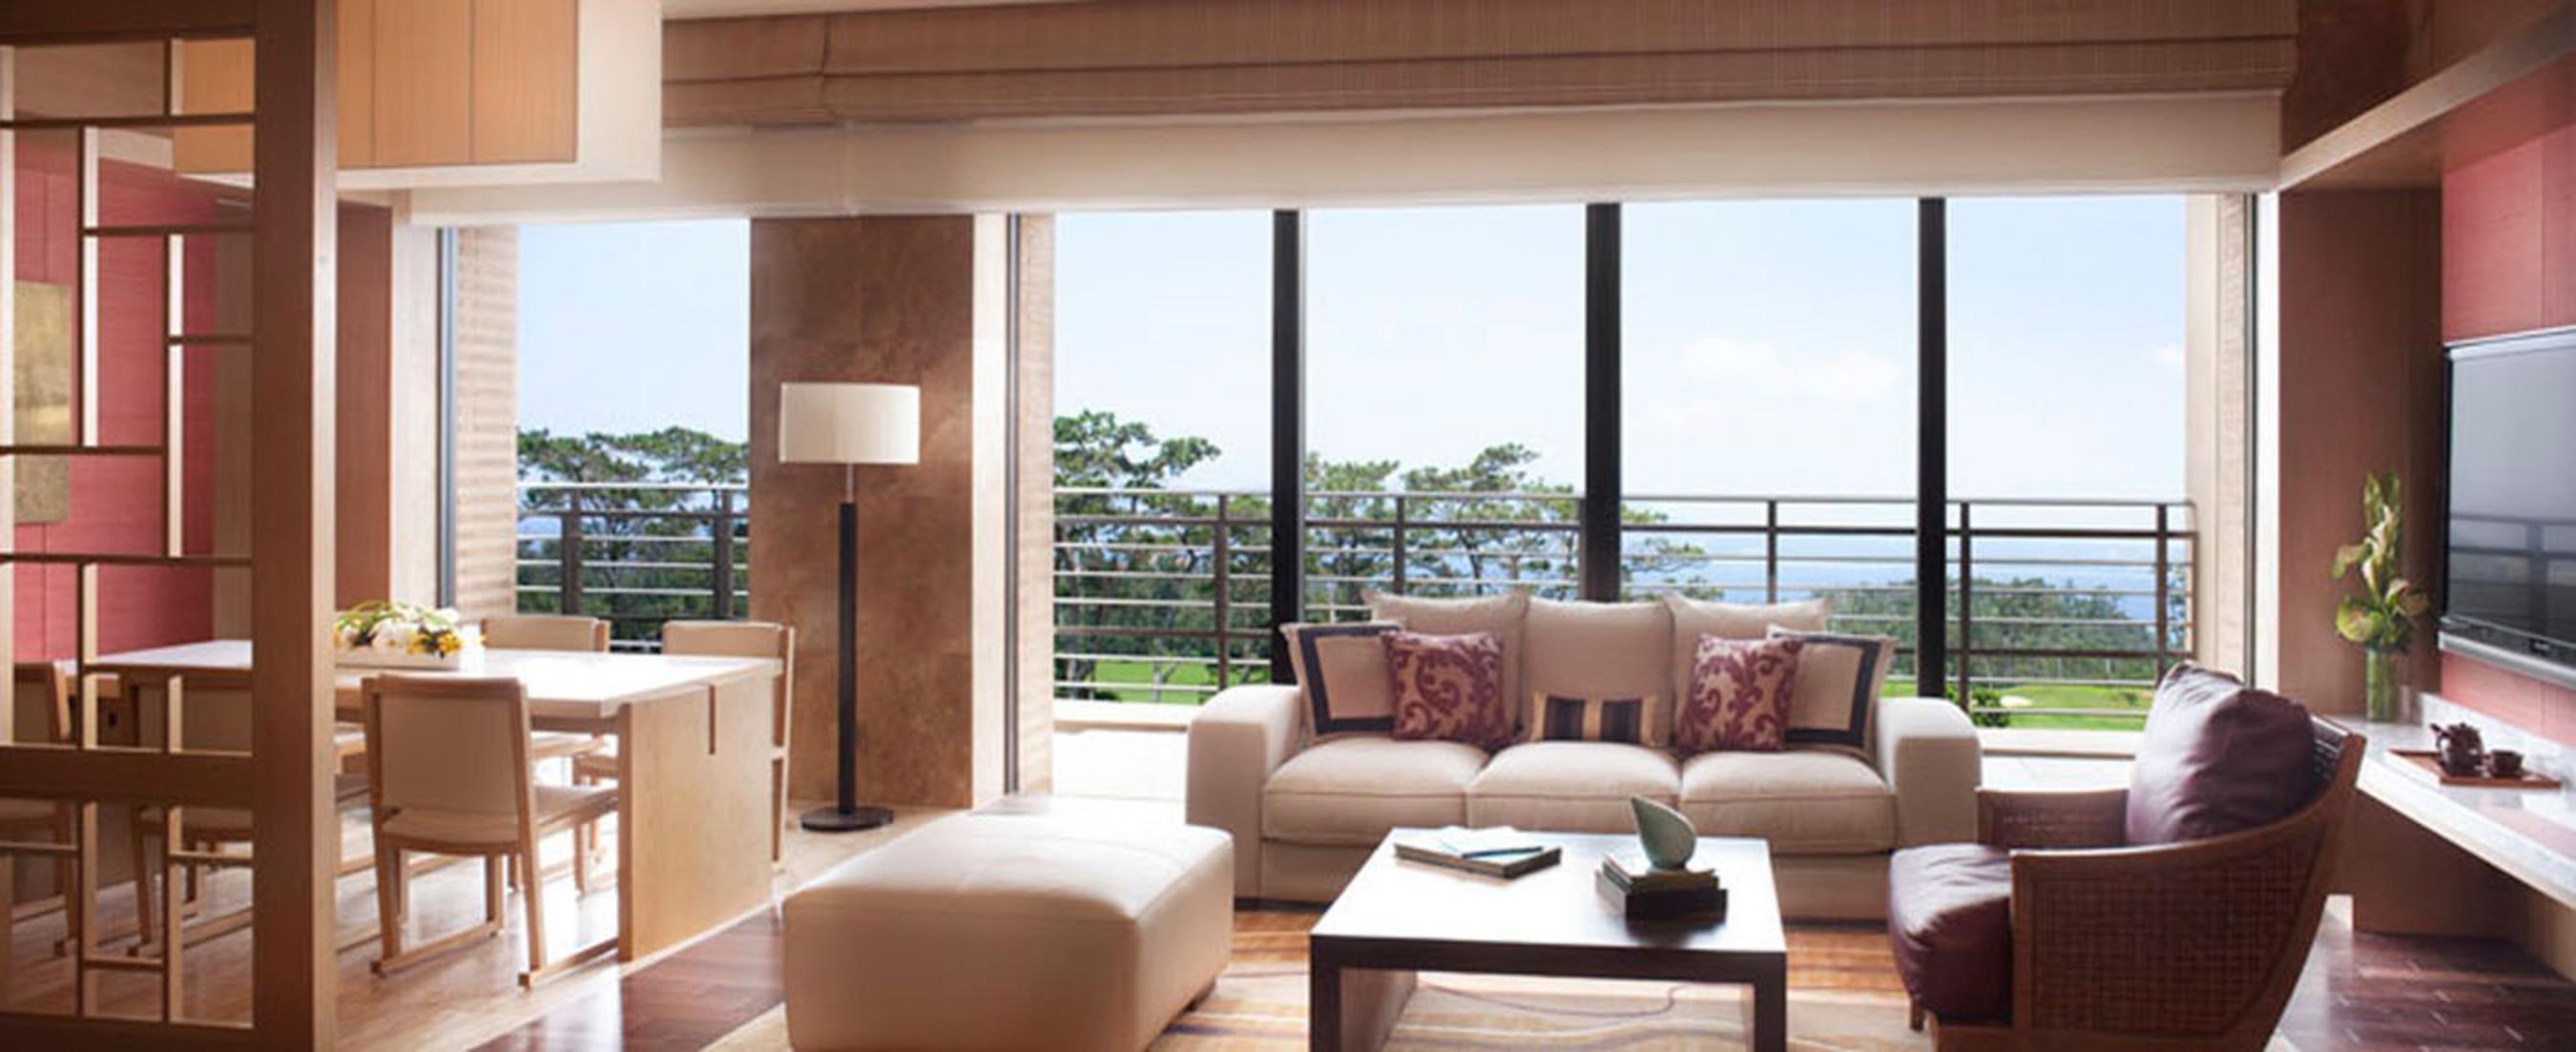 The Ritz-Carlton Hotel Company, L.L.C. Opens Its First Luxury Resort In Japan.  (PRNewsFoto/The Ritz-Carlton Hotel Company, L.L.C.)